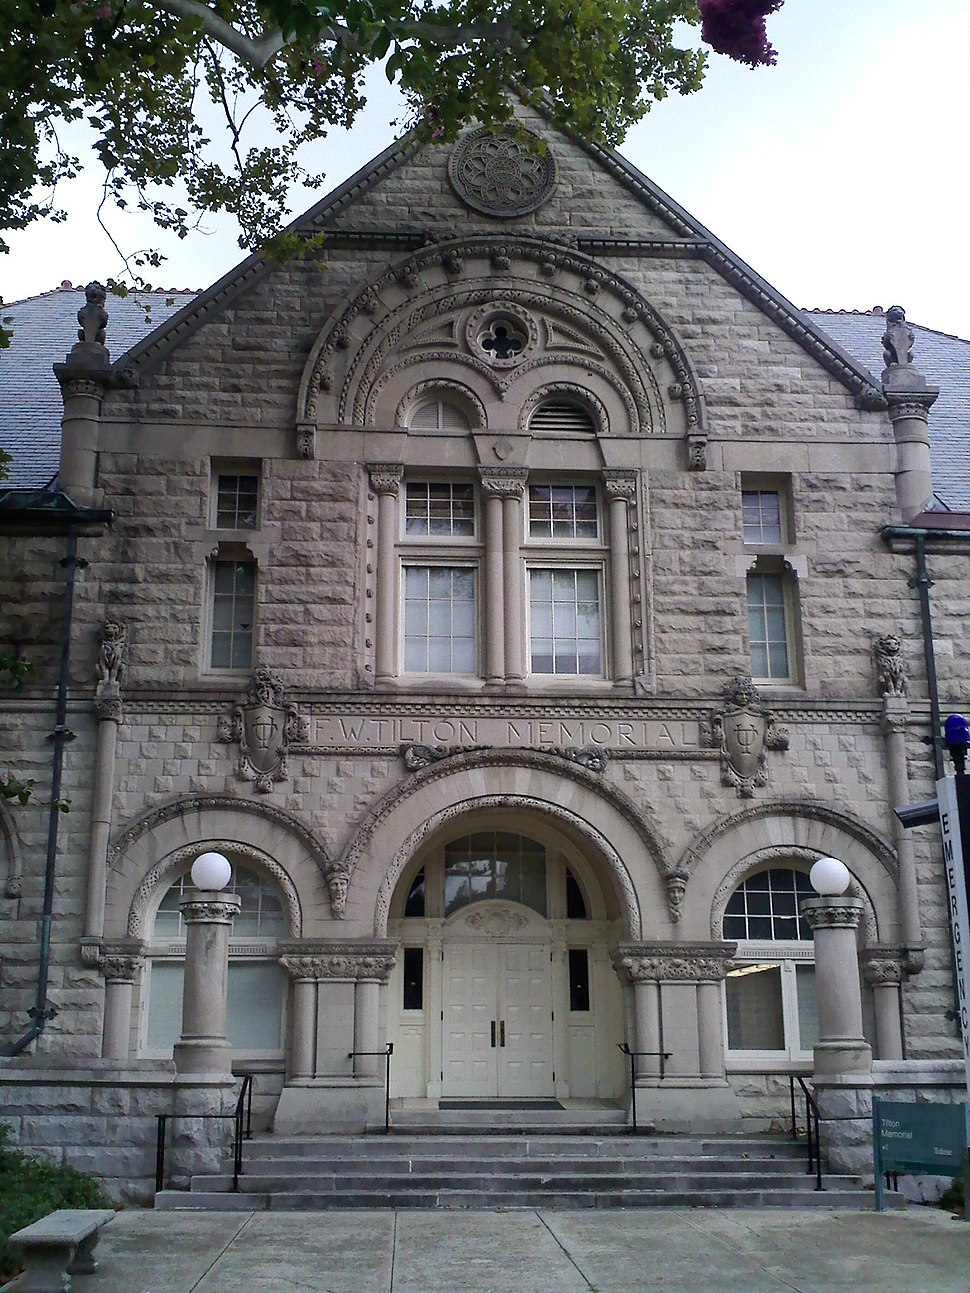 Tilton Memorial Hall